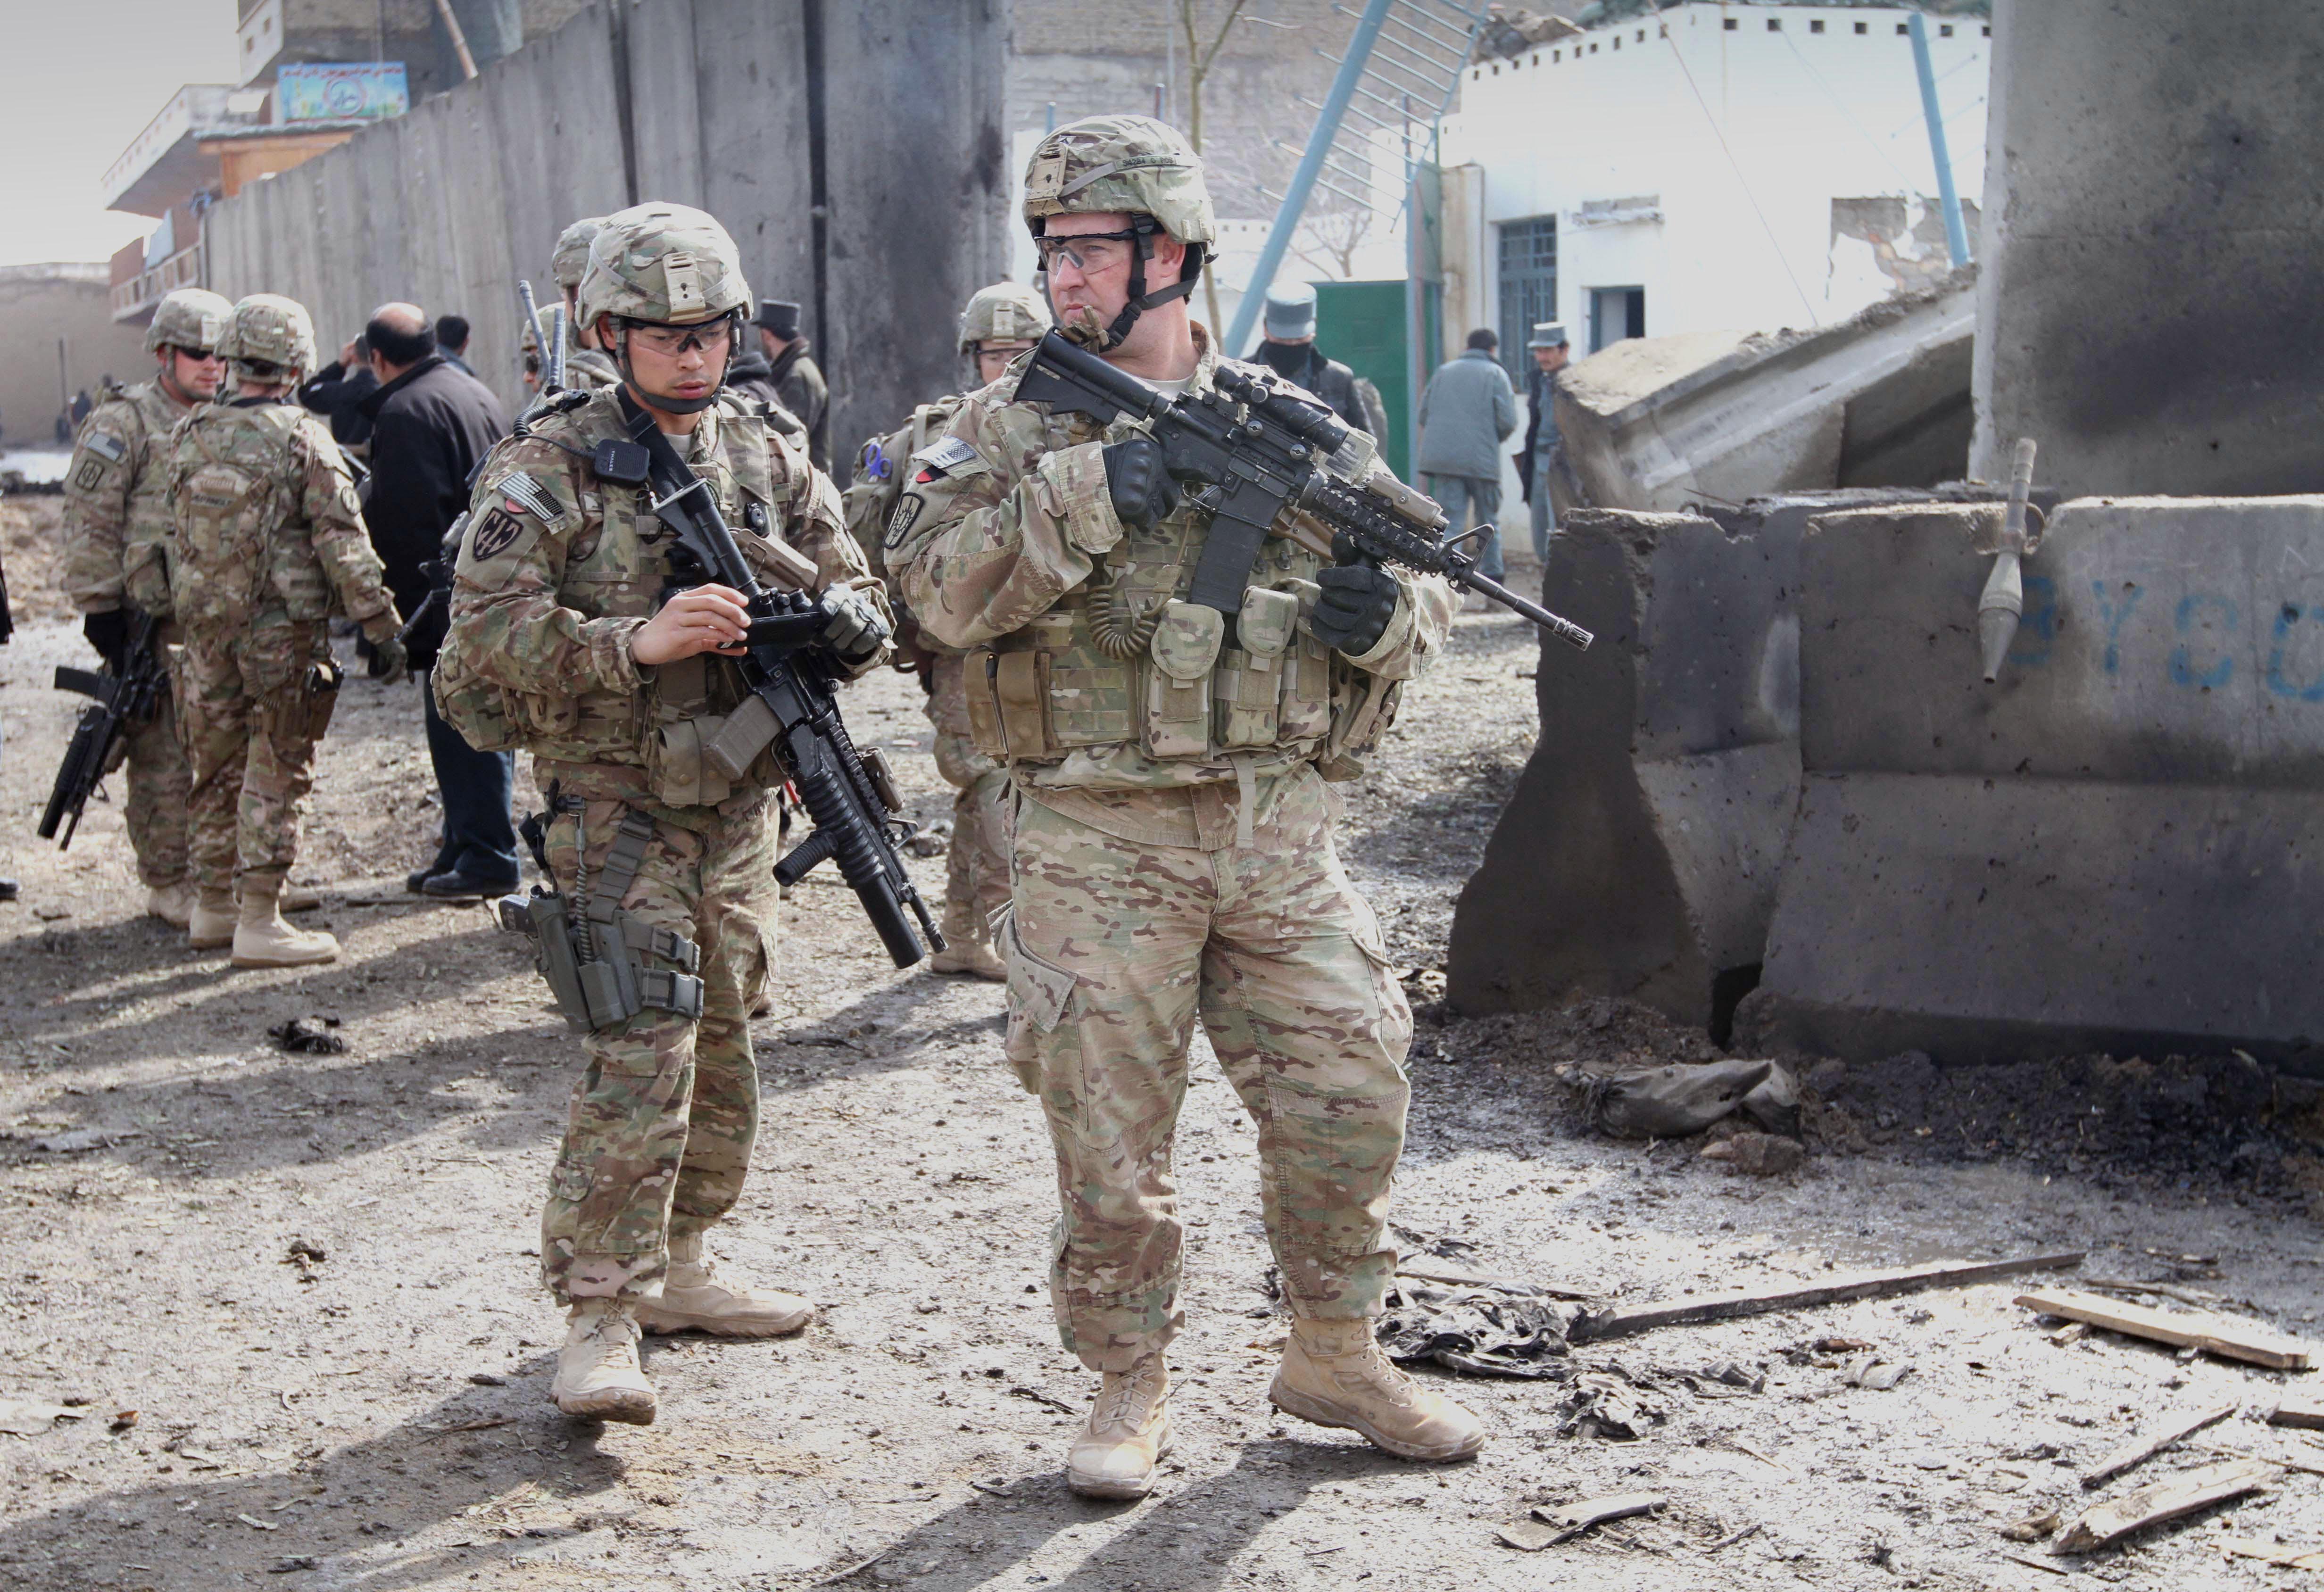 Kriget i irak saddam har full kontroll